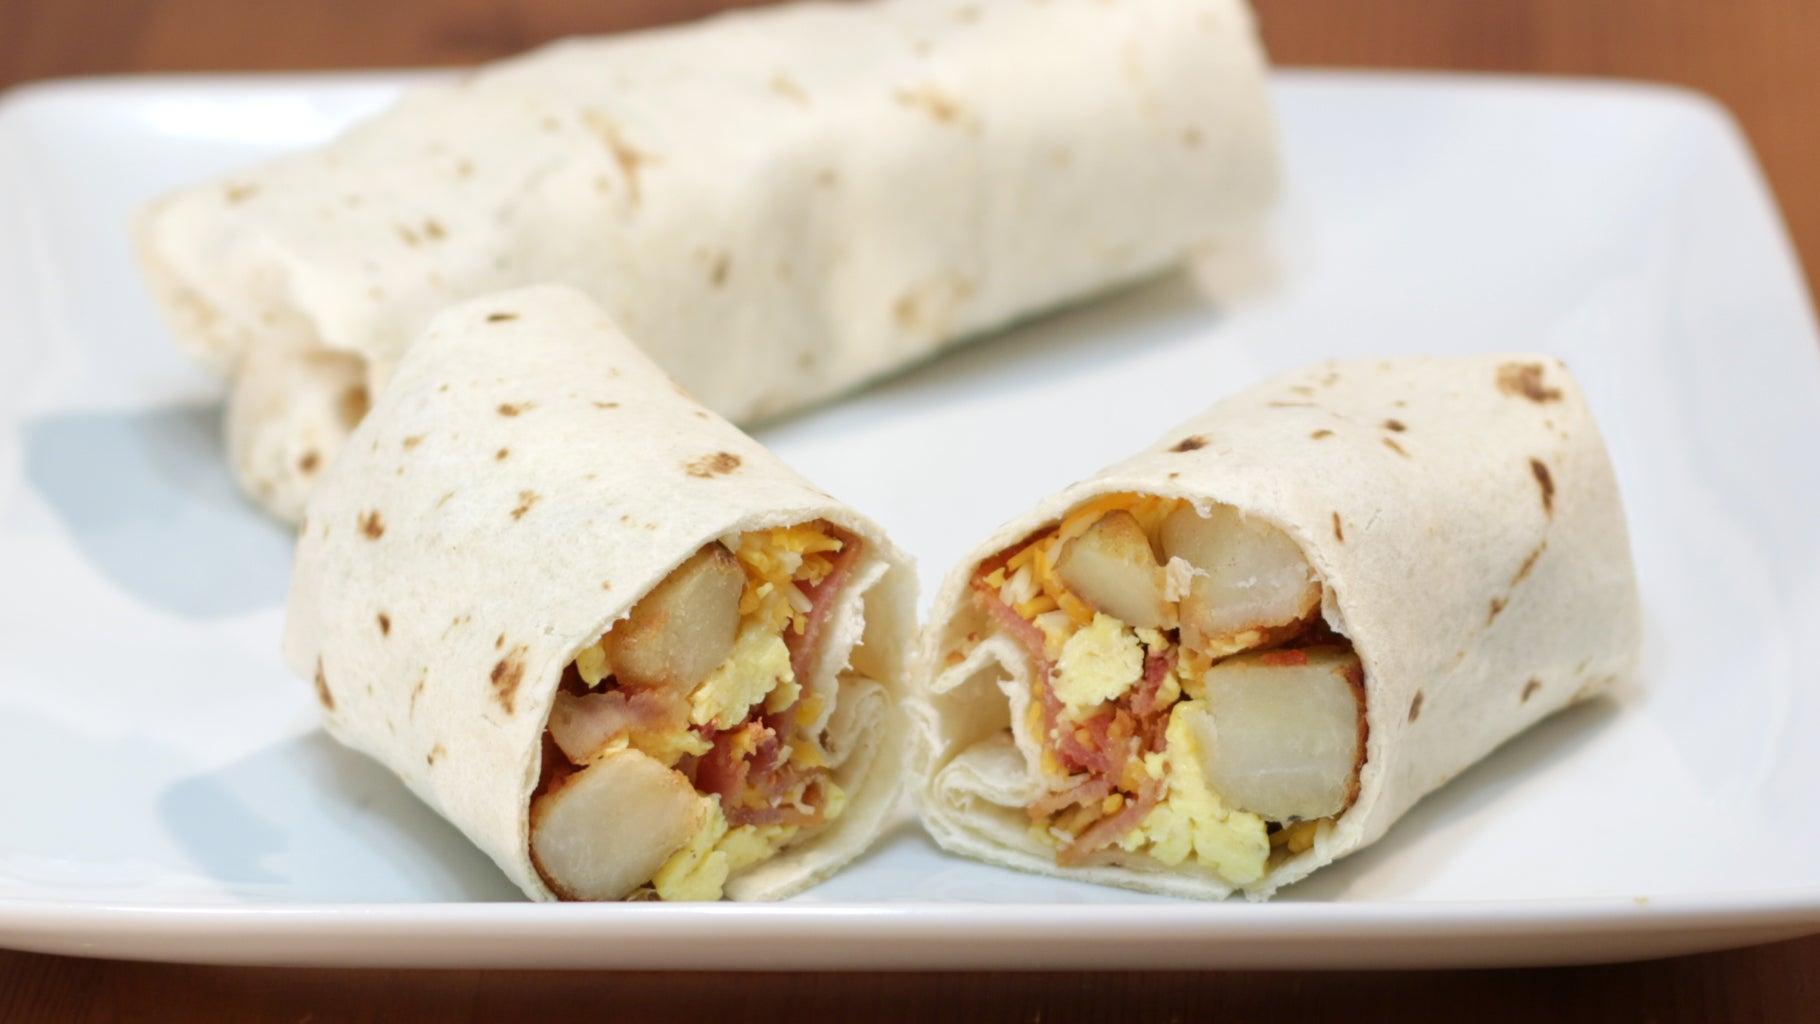 Yummy Breakfast Burrito